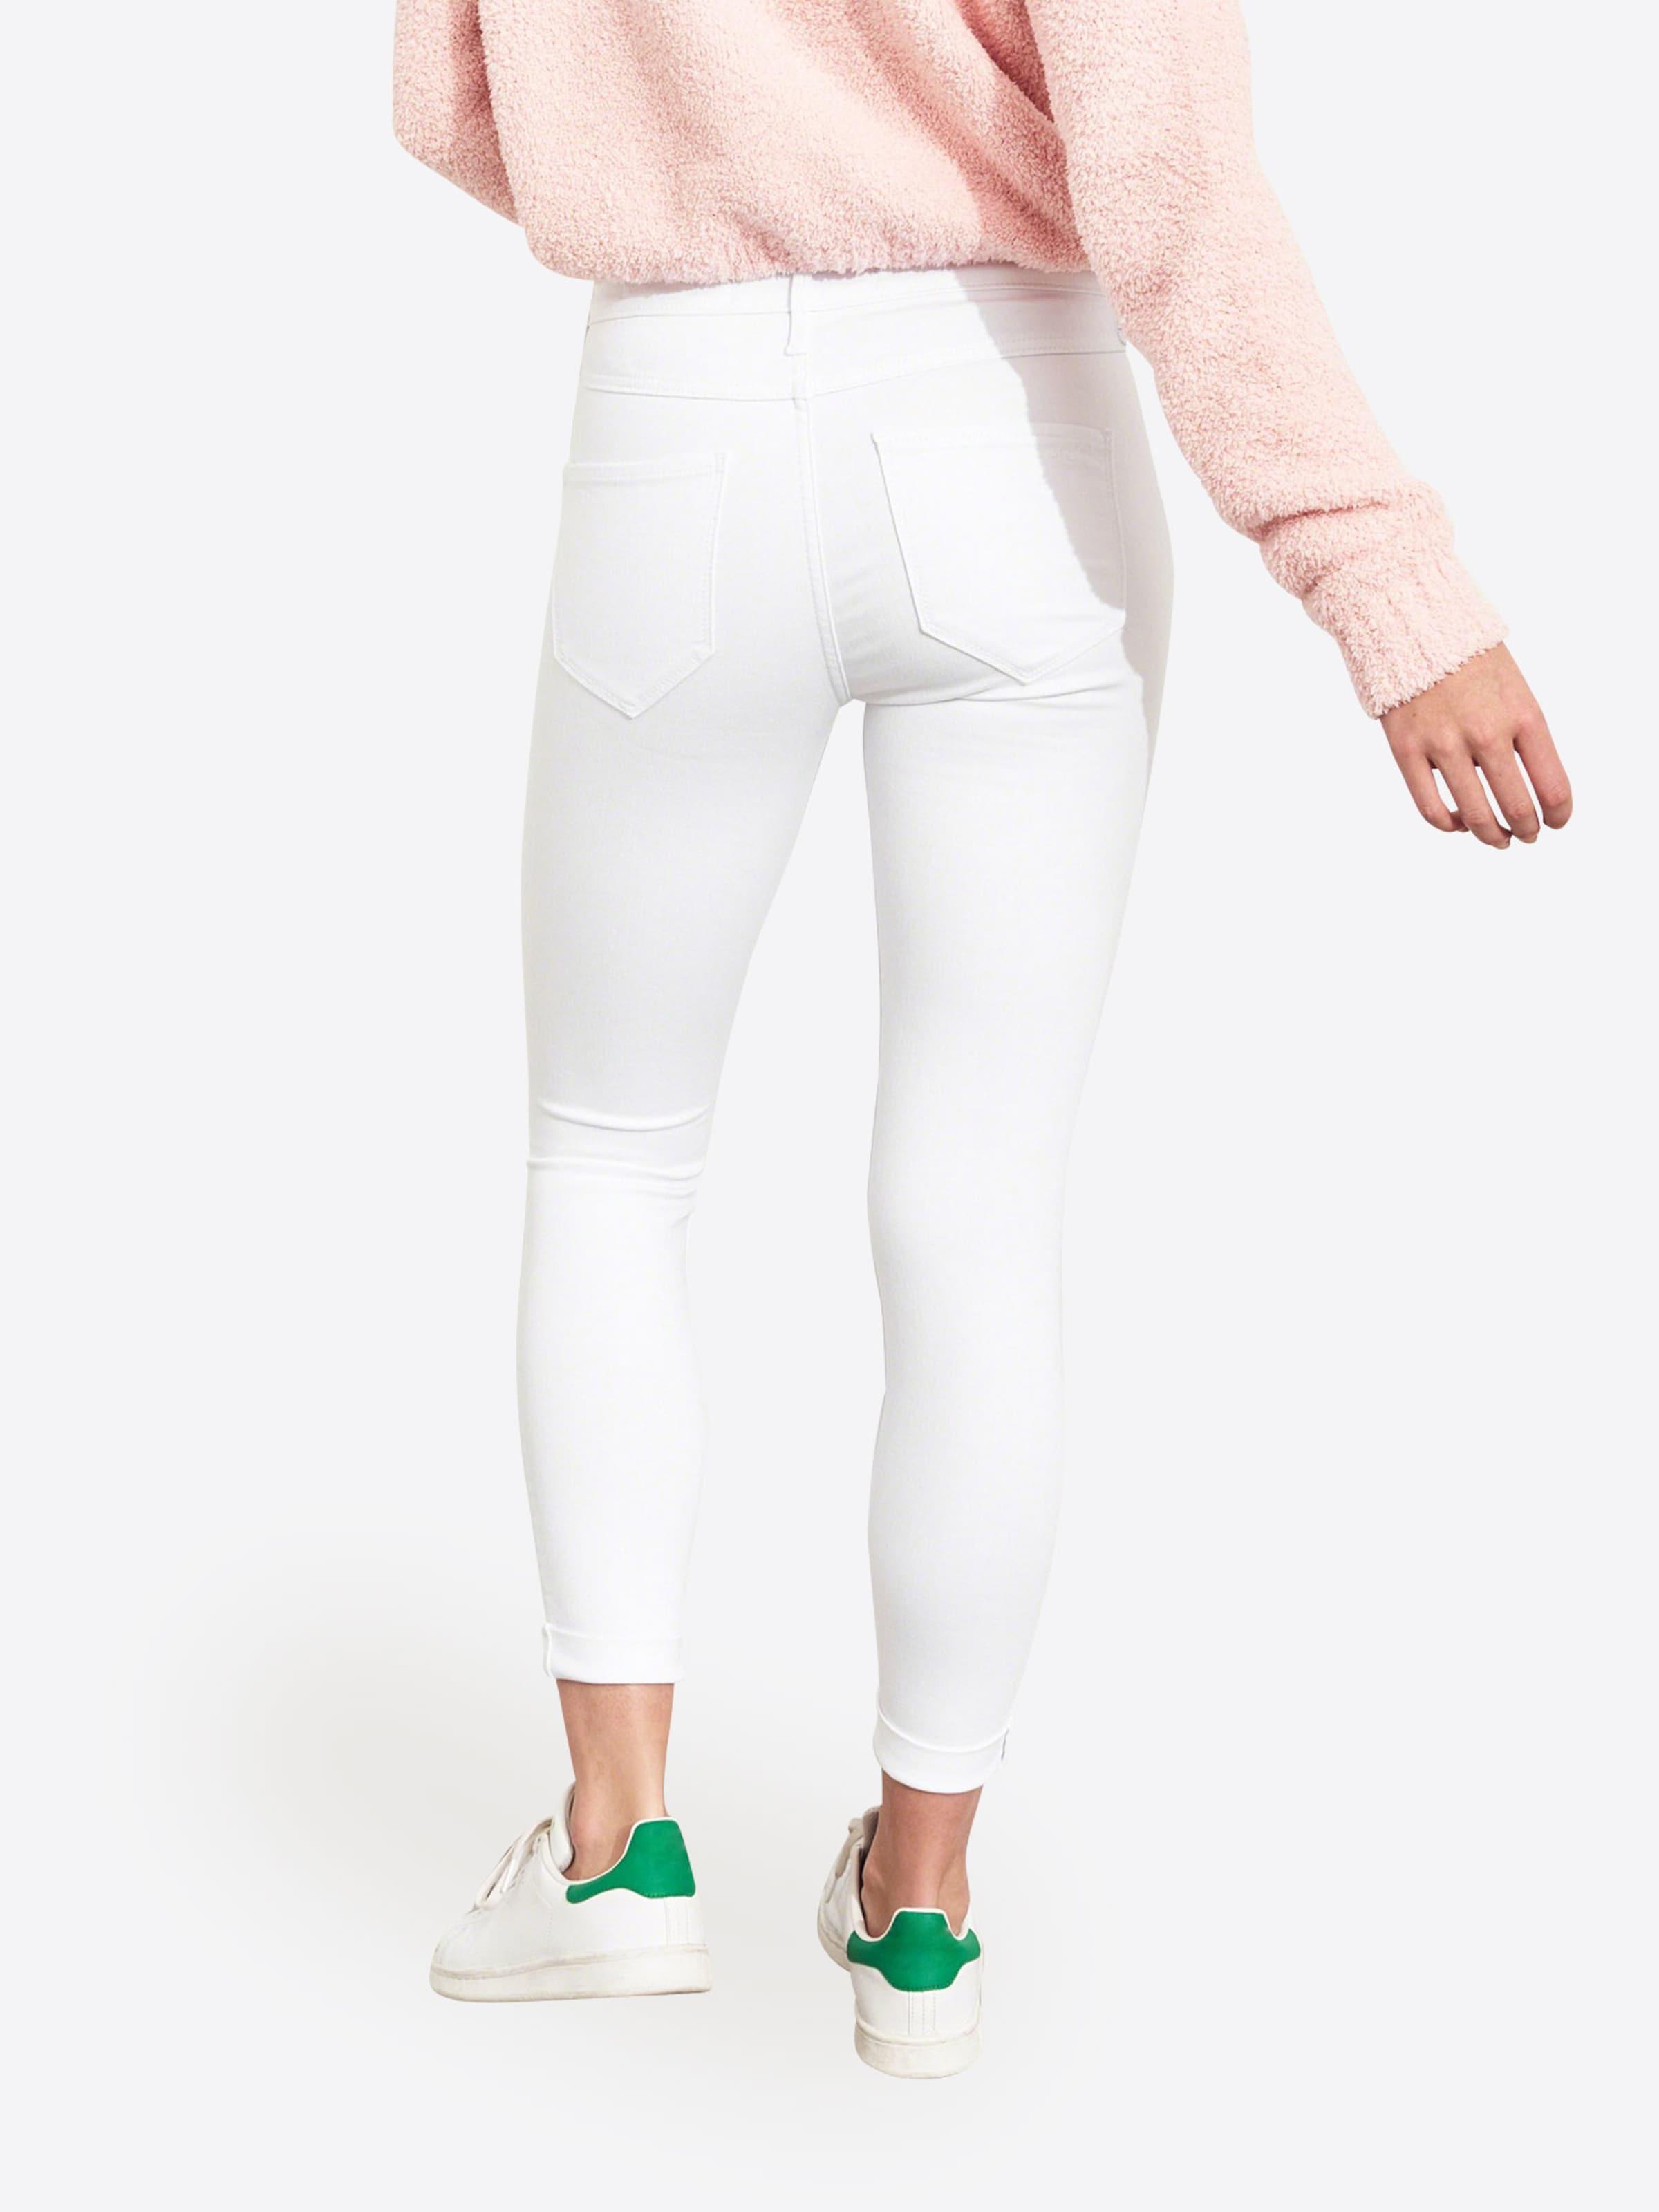 Jeans 'sb19 In Exp wt Shnk White Hrjl Denim Crop' Hollister 0mN8wOvn